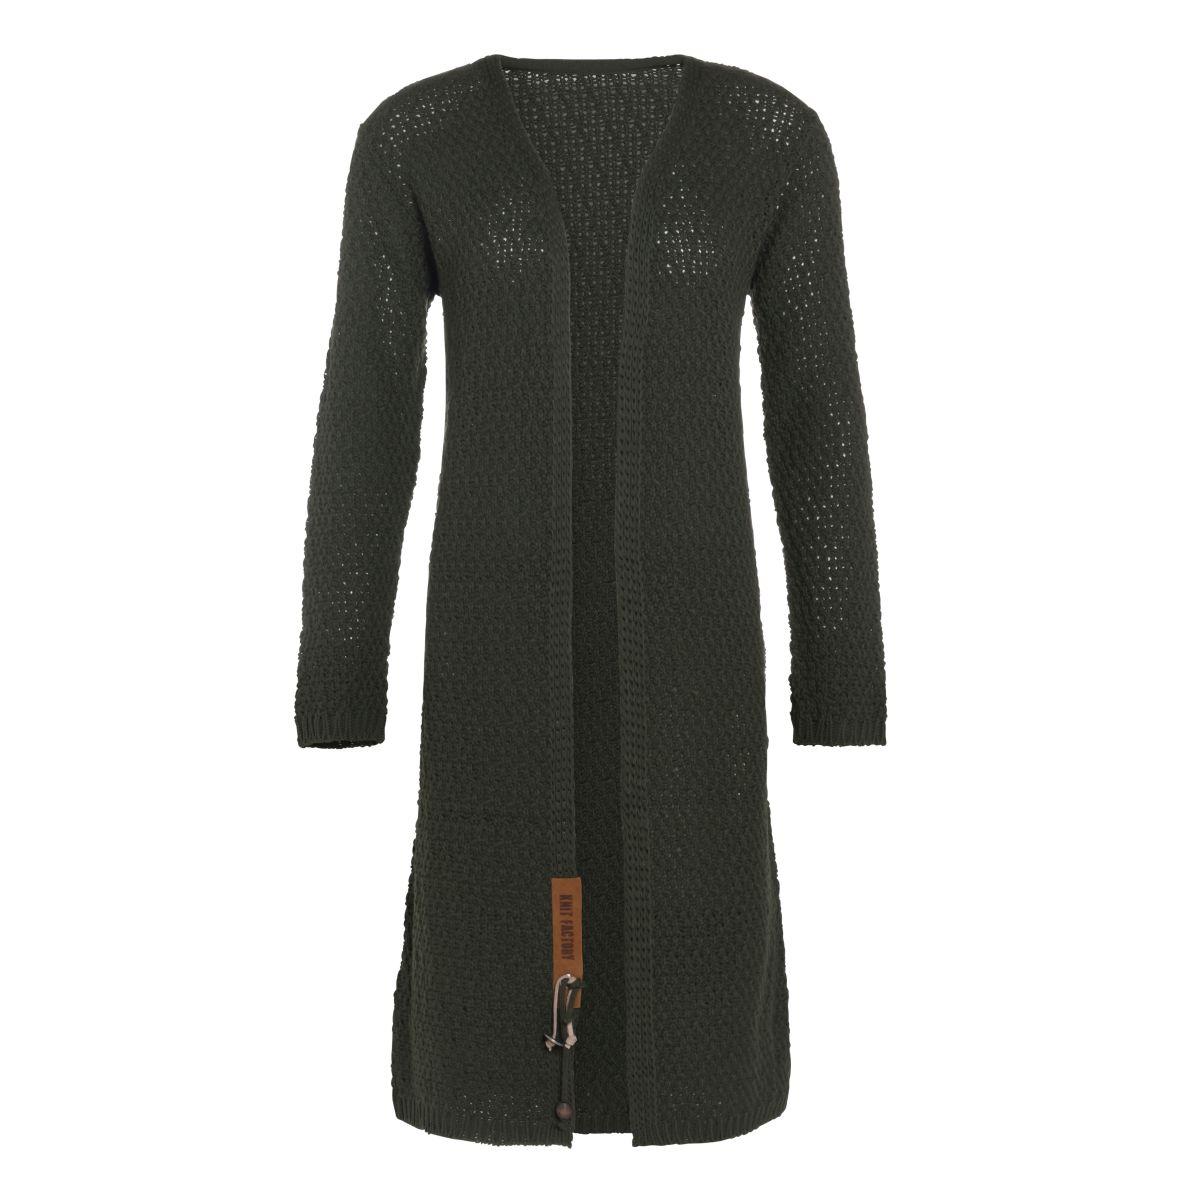 luna long knitted cardigan khaki 4042